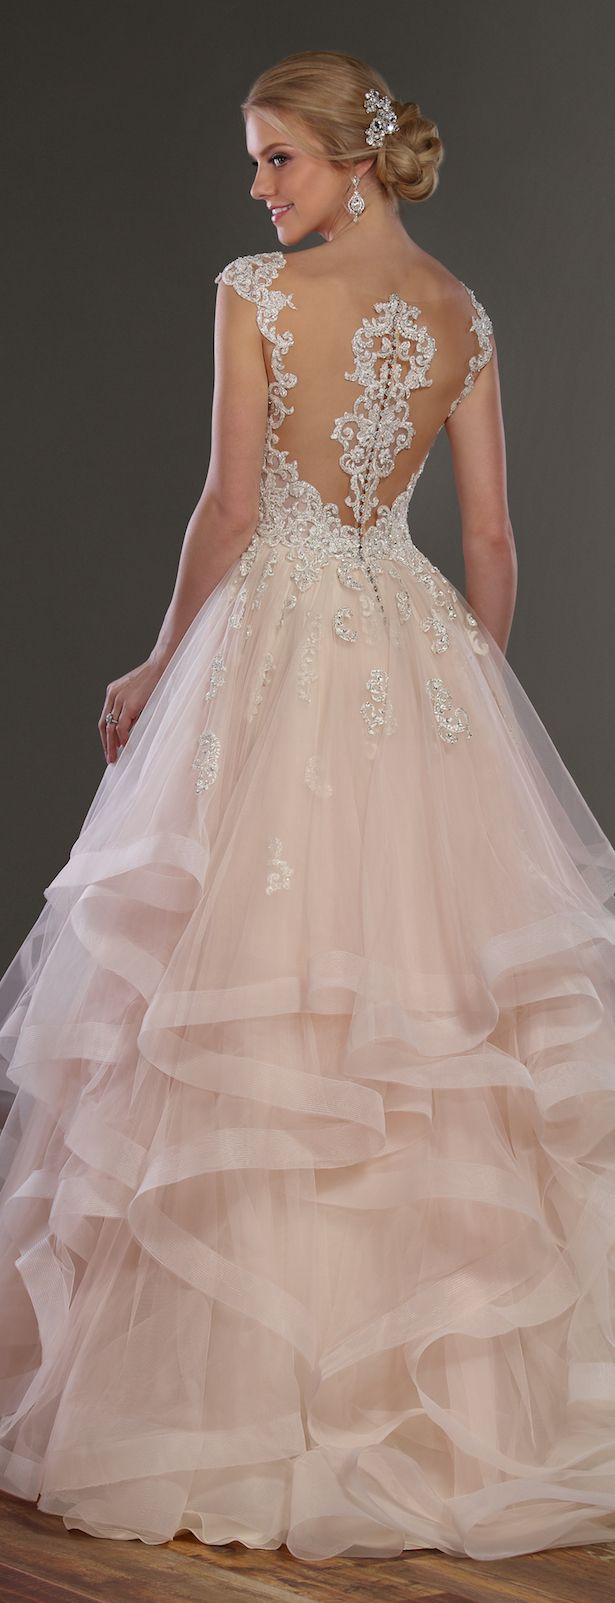 Wedding-Dresses-0162